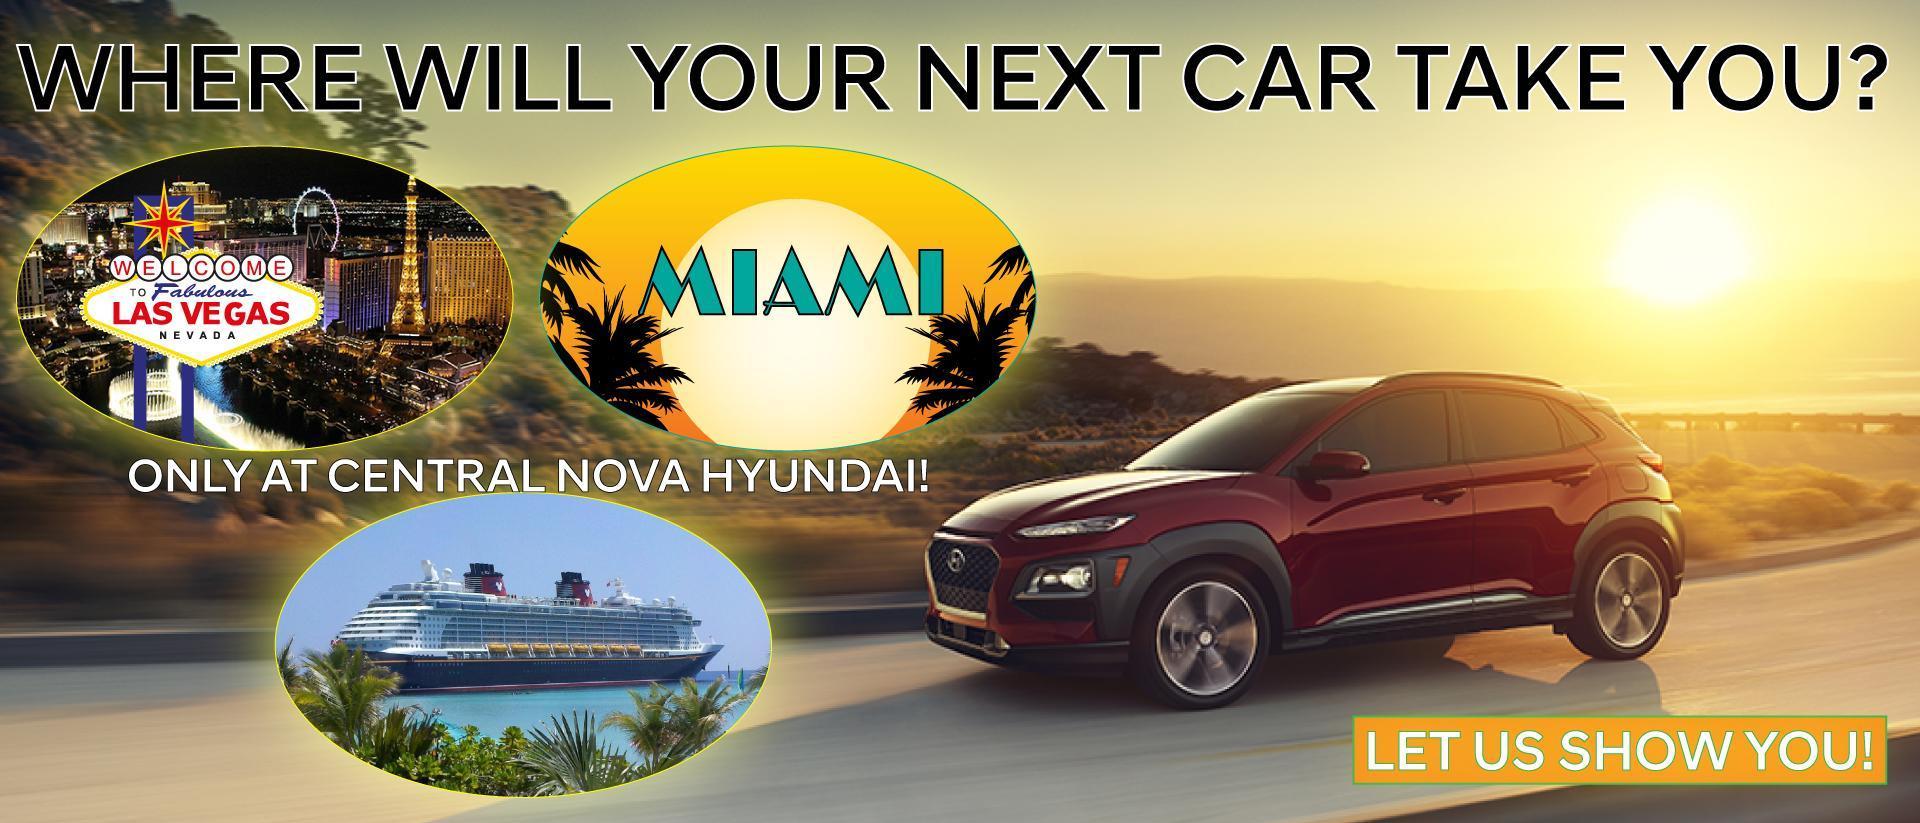 Central Nova Hyundai Vacation